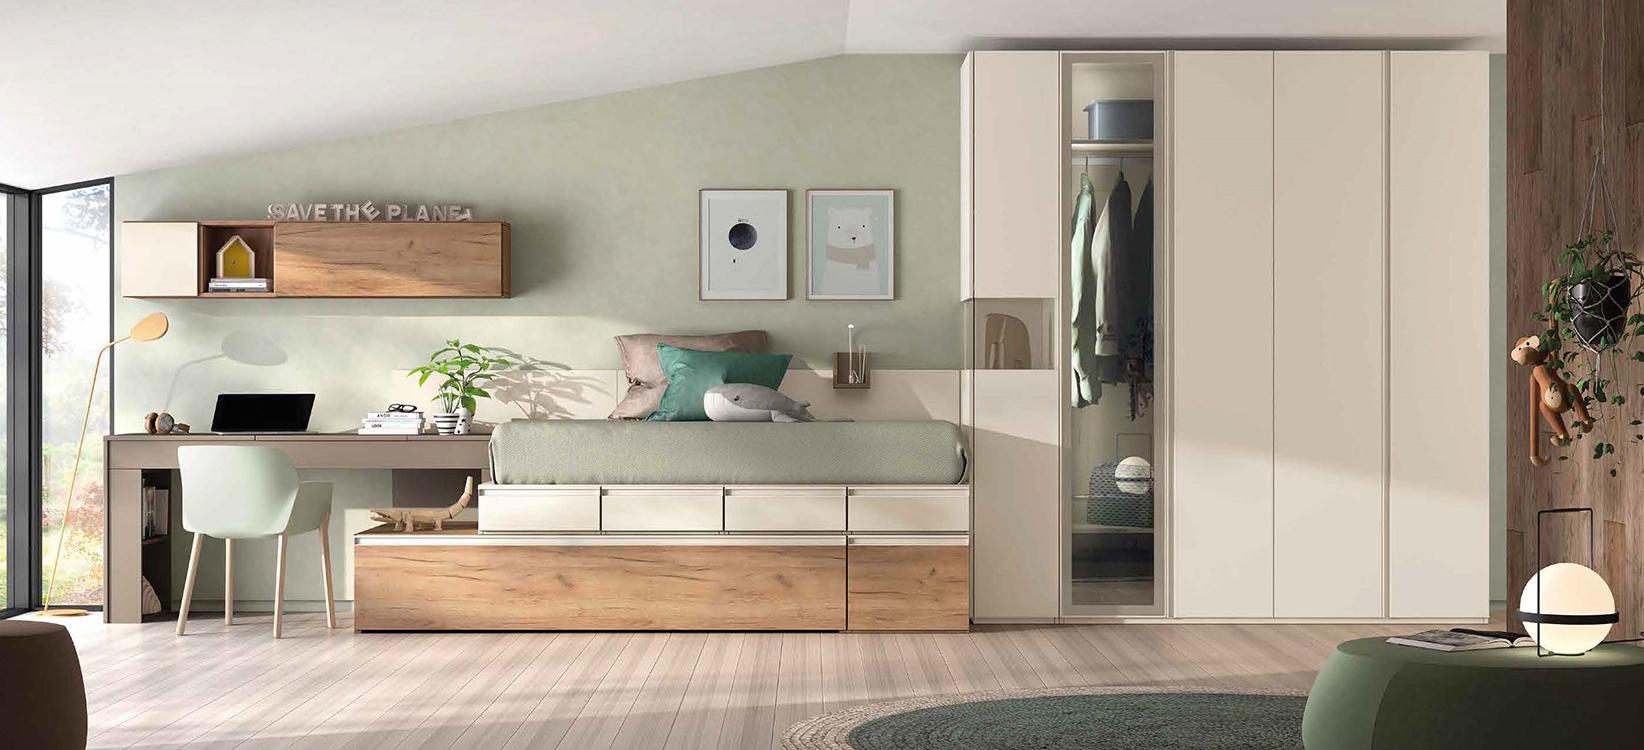 http://www.munozmuebles.net/nueva/catalogo/juveniles-modulares.html -  Espectaculares muebles de color salmón